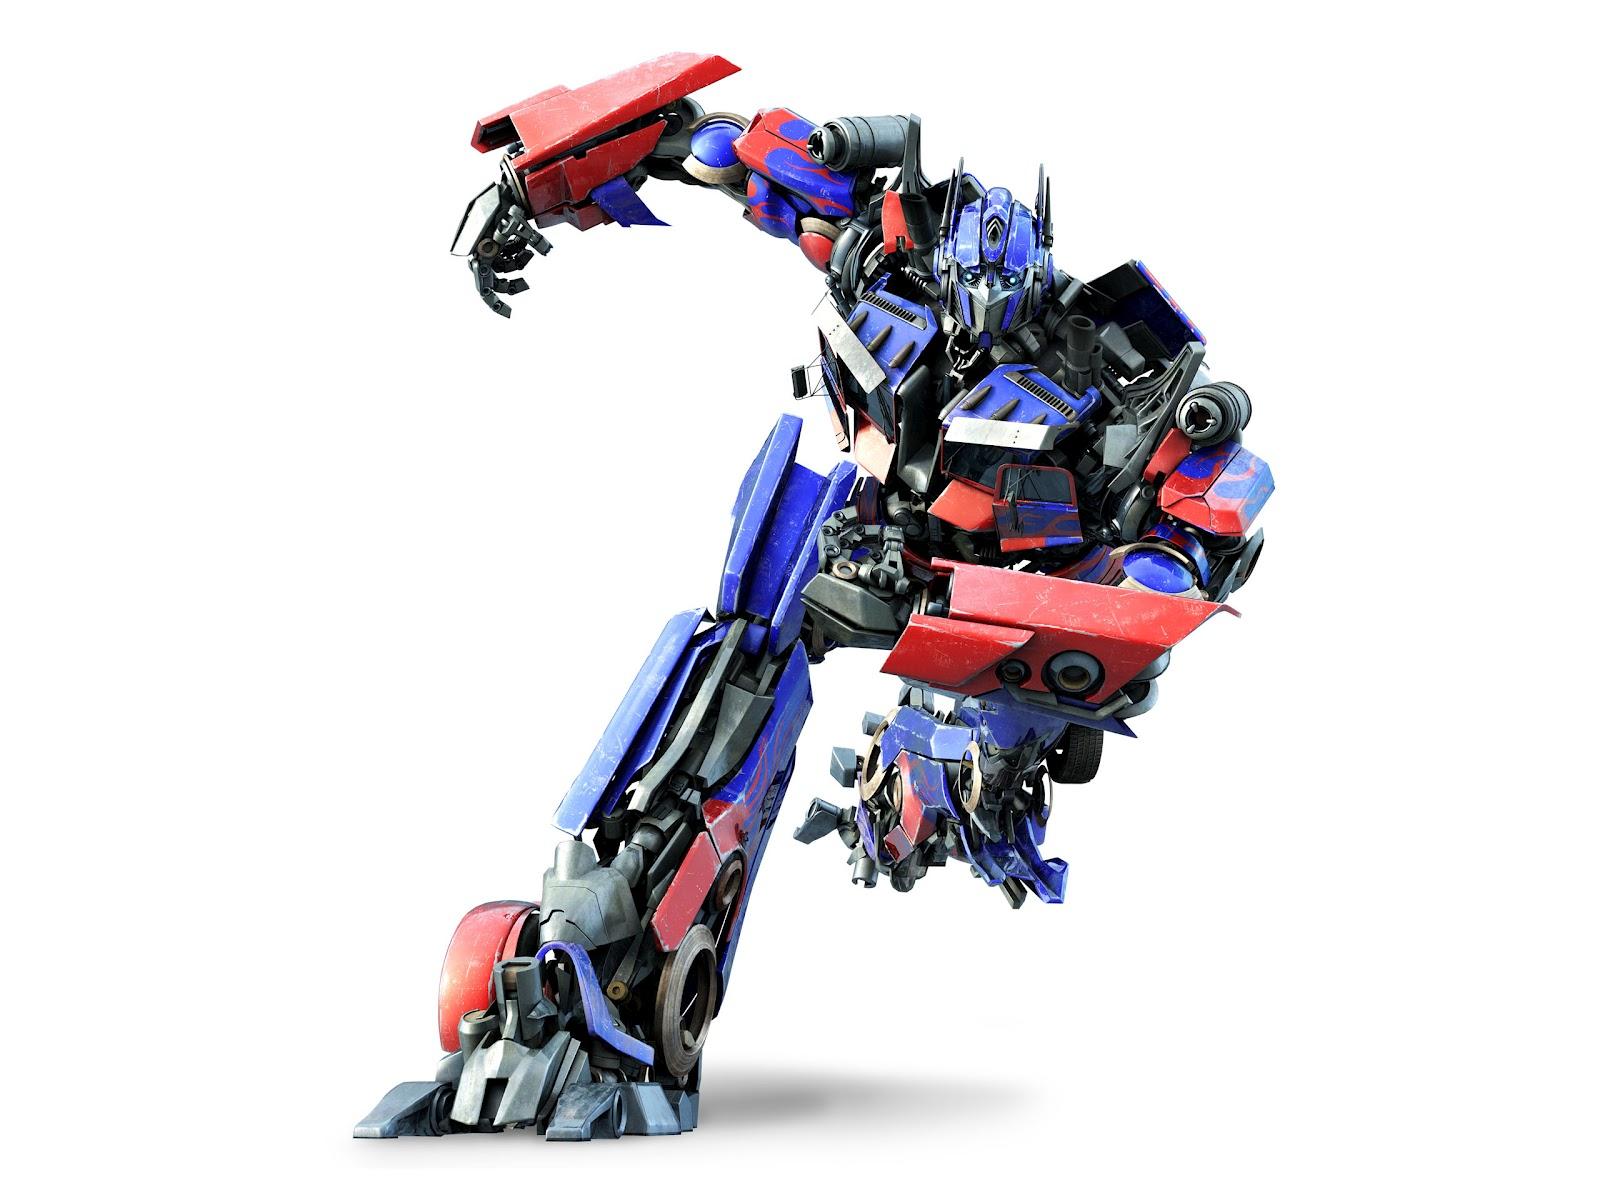 Killzone Shadow Fall Iphone 5 Wallpaper Wallpapers Hd Transformers Robots De La Pelicula Movie